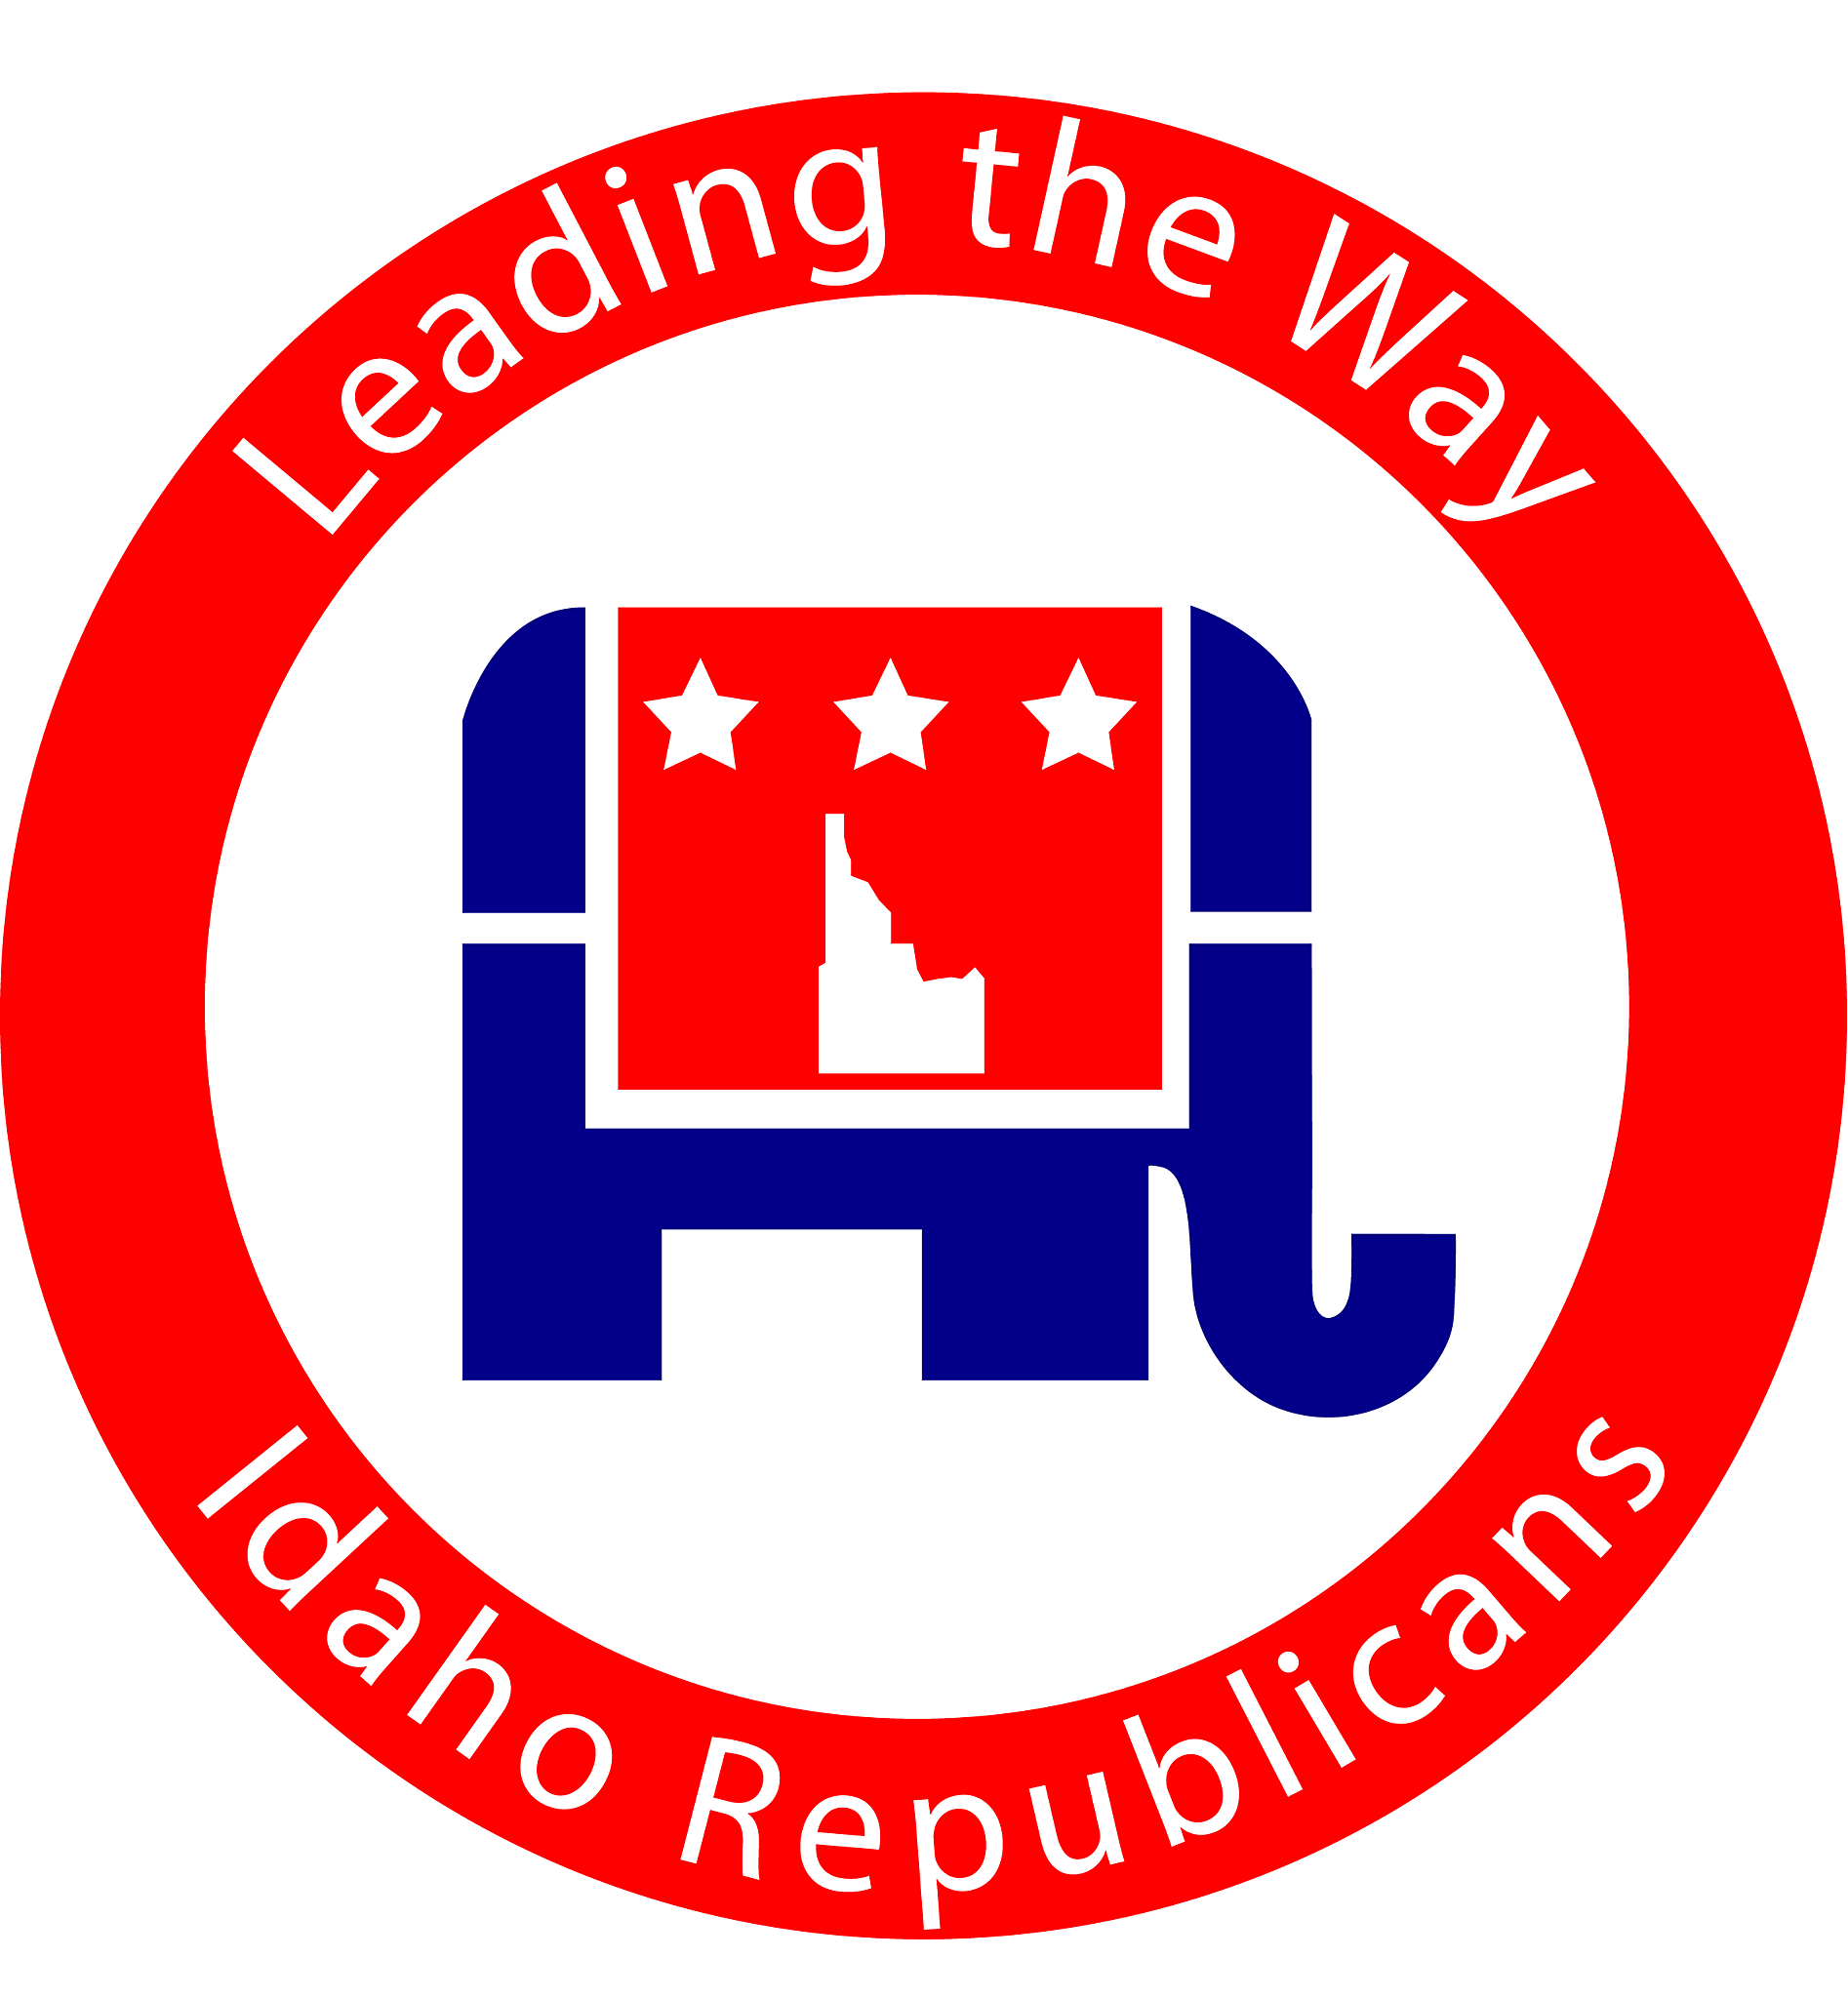 The Republican News: Idaho Republican Party Backs Trump To Beat Hillary